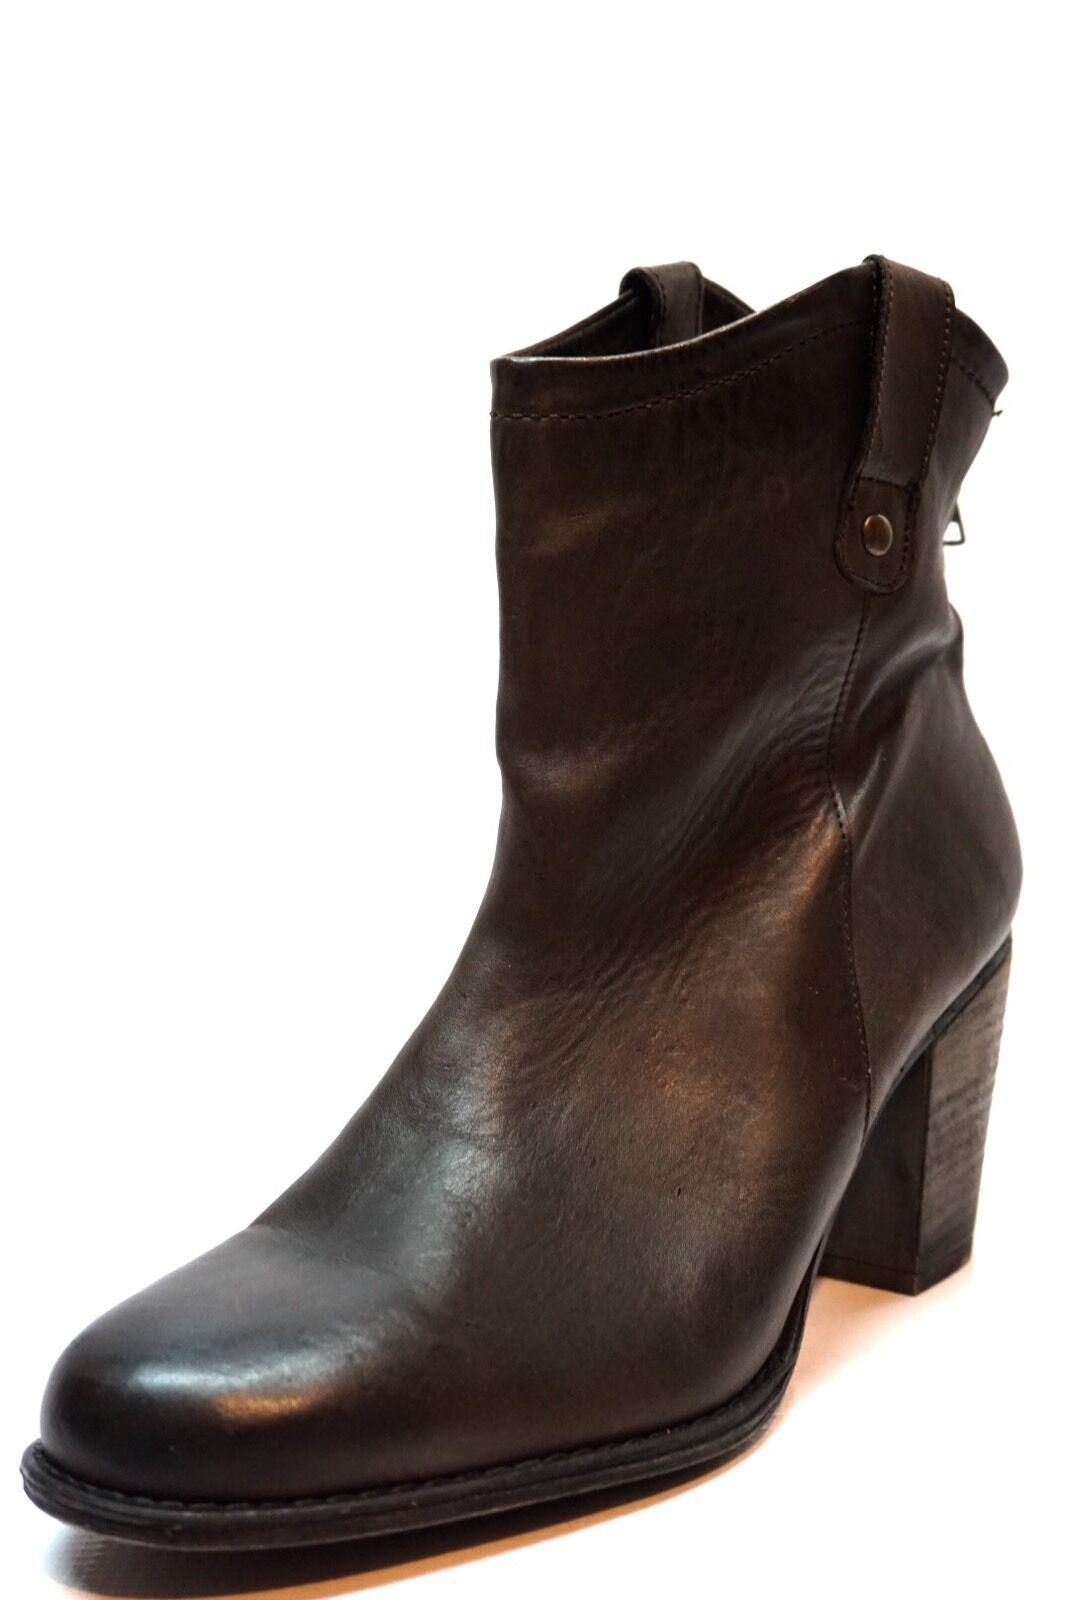 ZIGI GIRL Taralyn Brown Leather Western Ankle Boots Women's Size 10 M